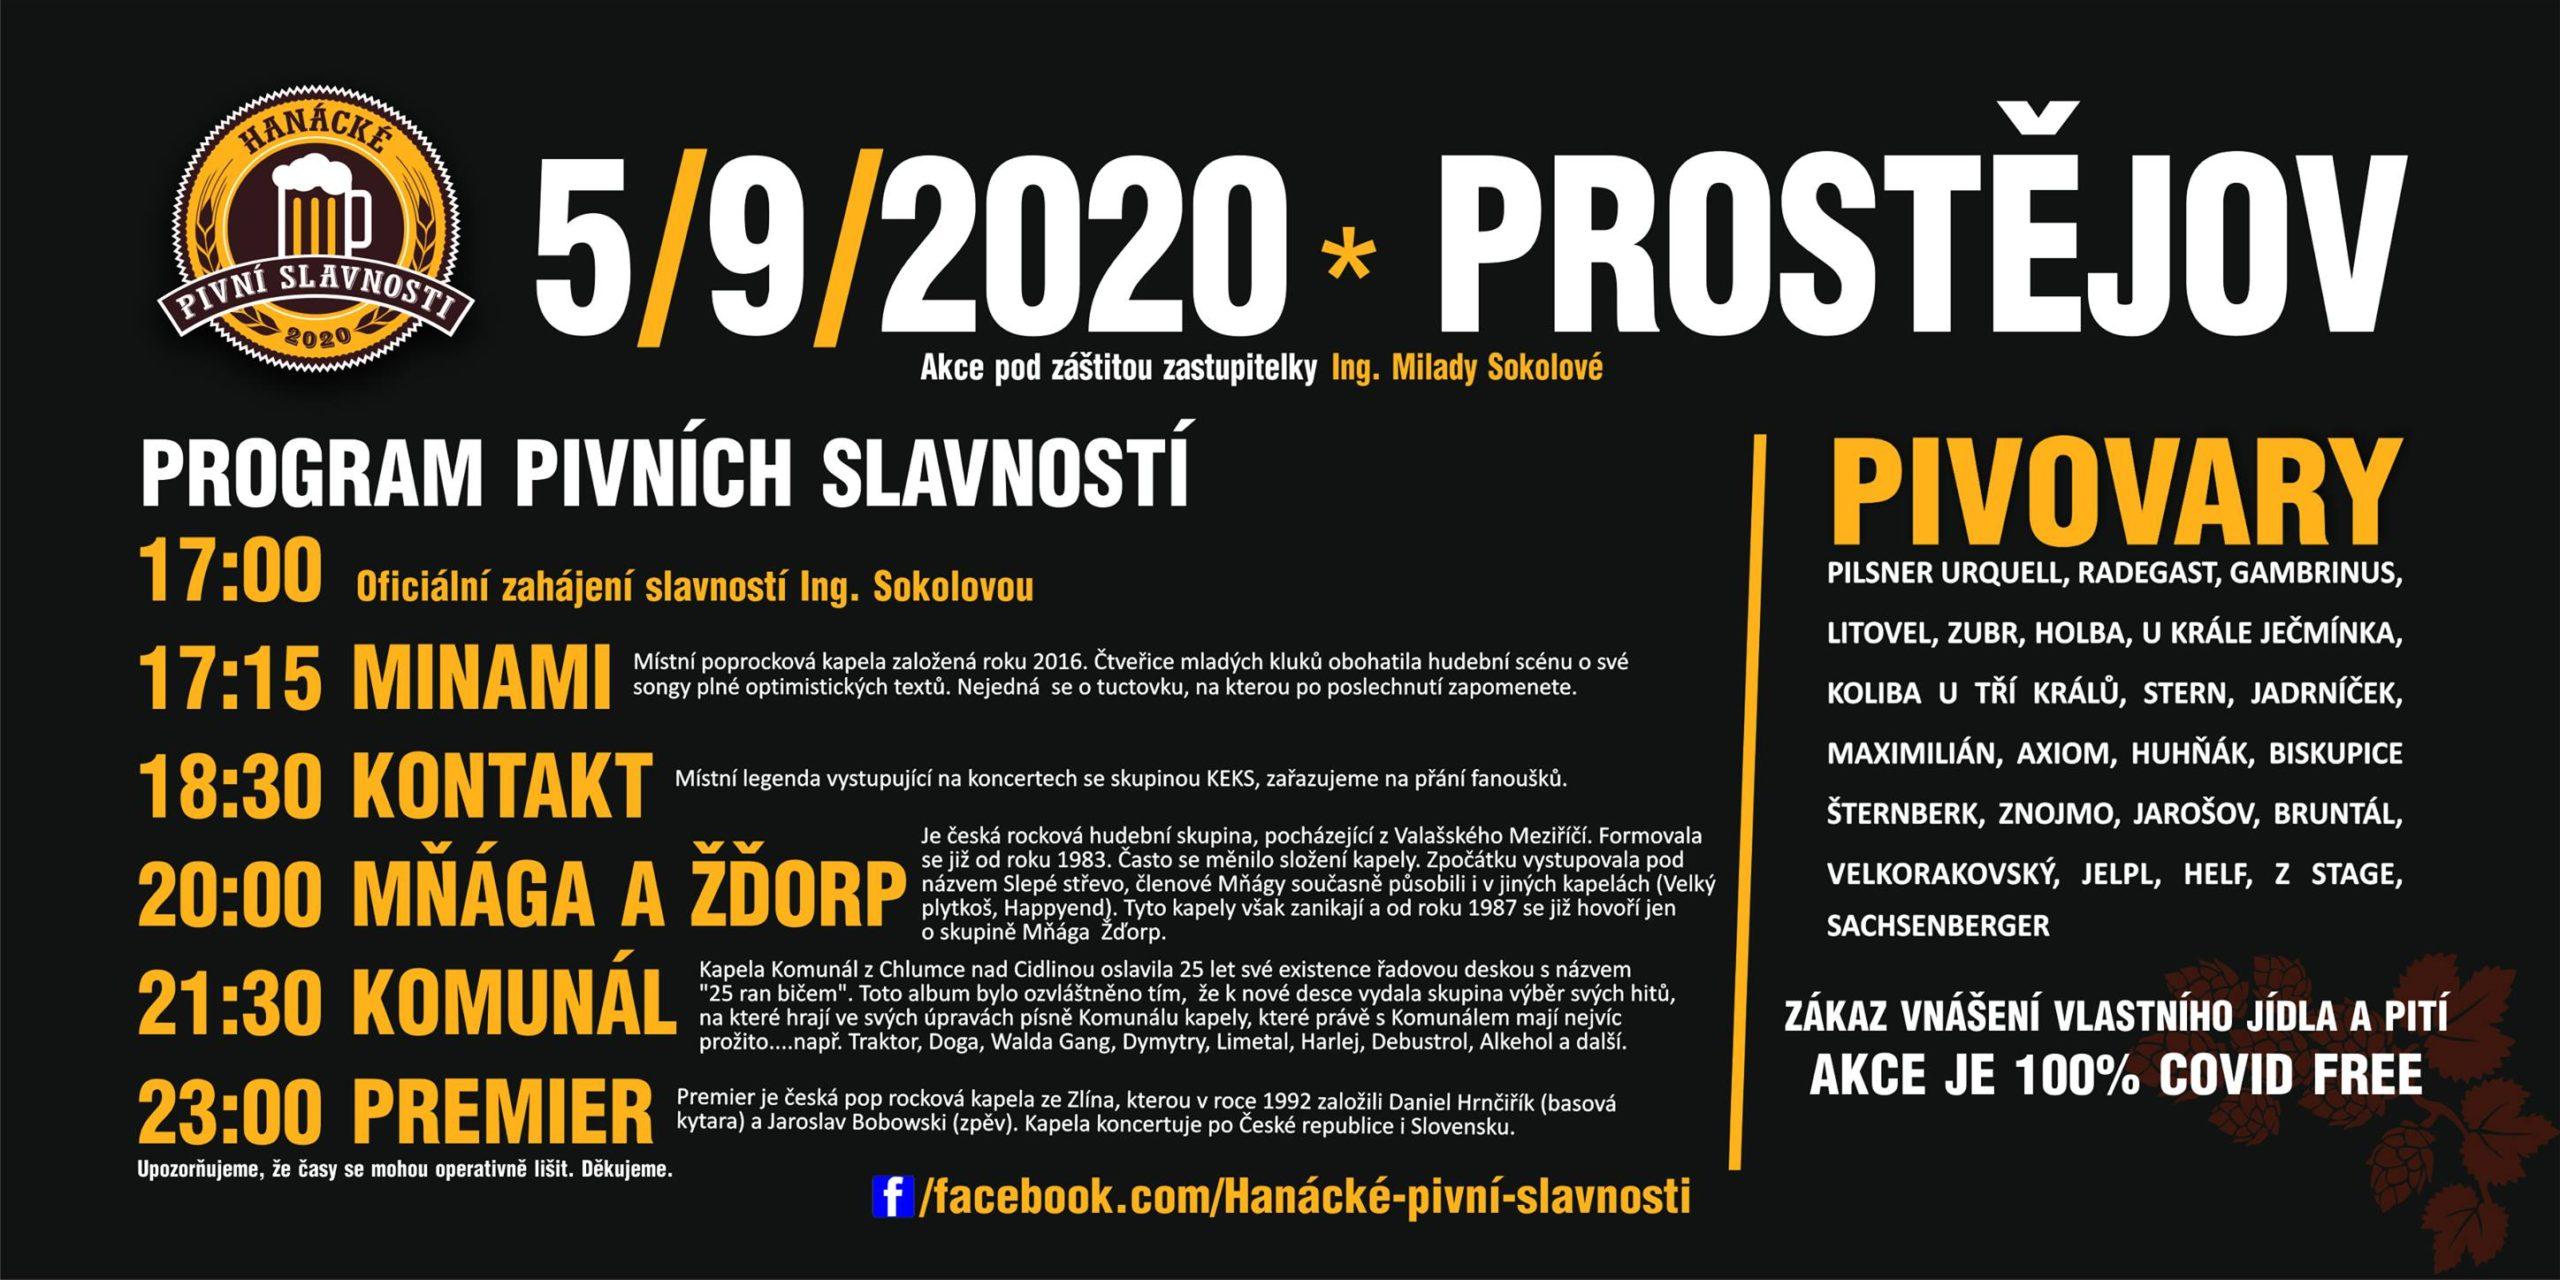 pivovari-pivovary-pivni-akce-hanacke-pivni-slavnosti-prostejov-2020